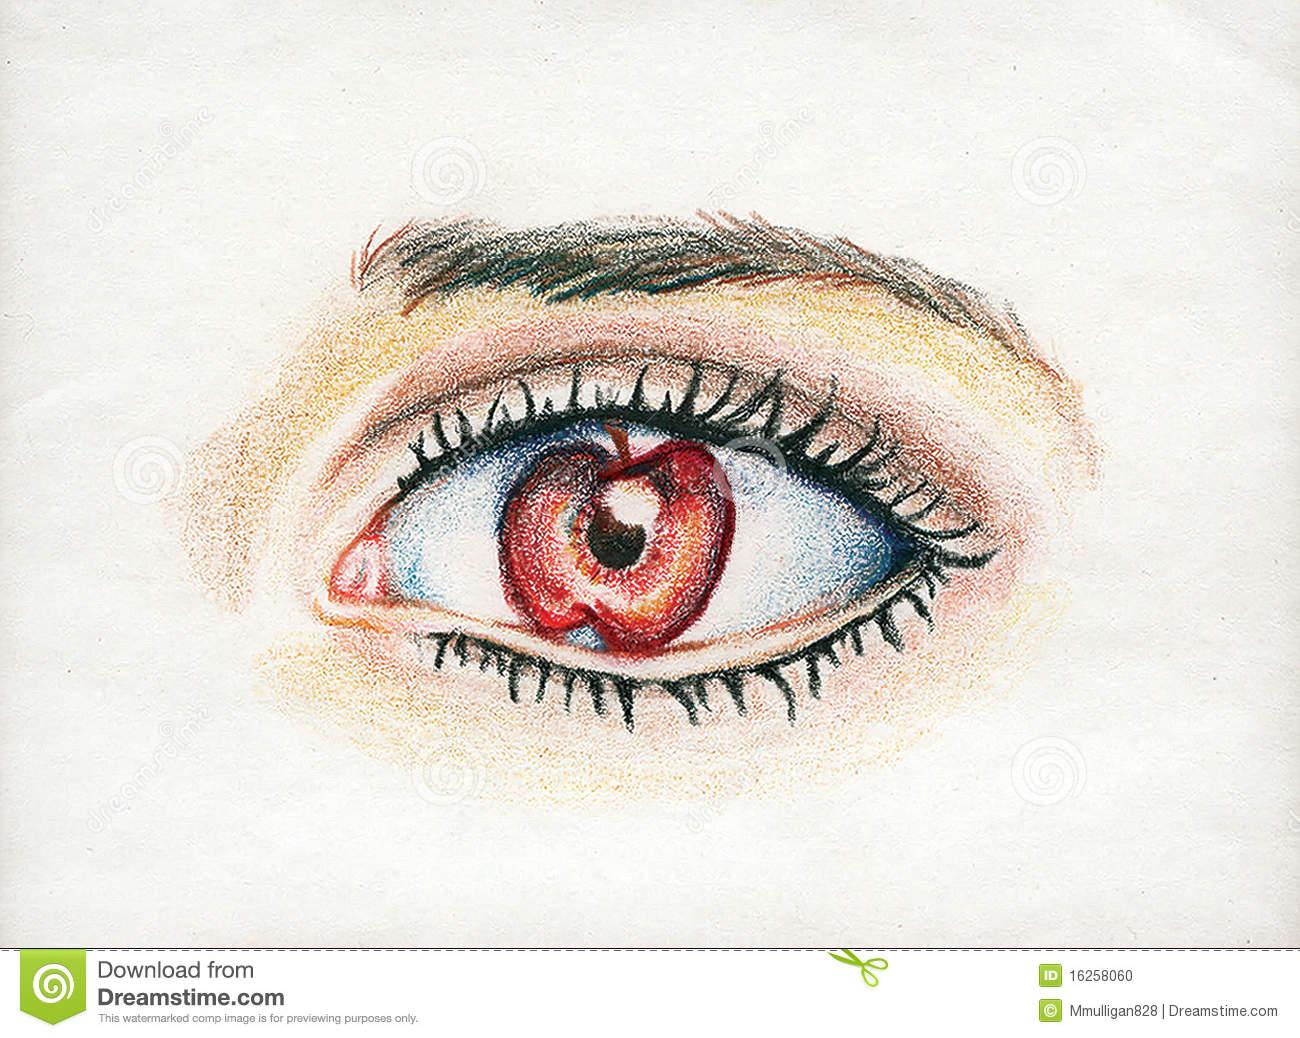 Apple of My Eye stock illustration. Illustration of lashes.